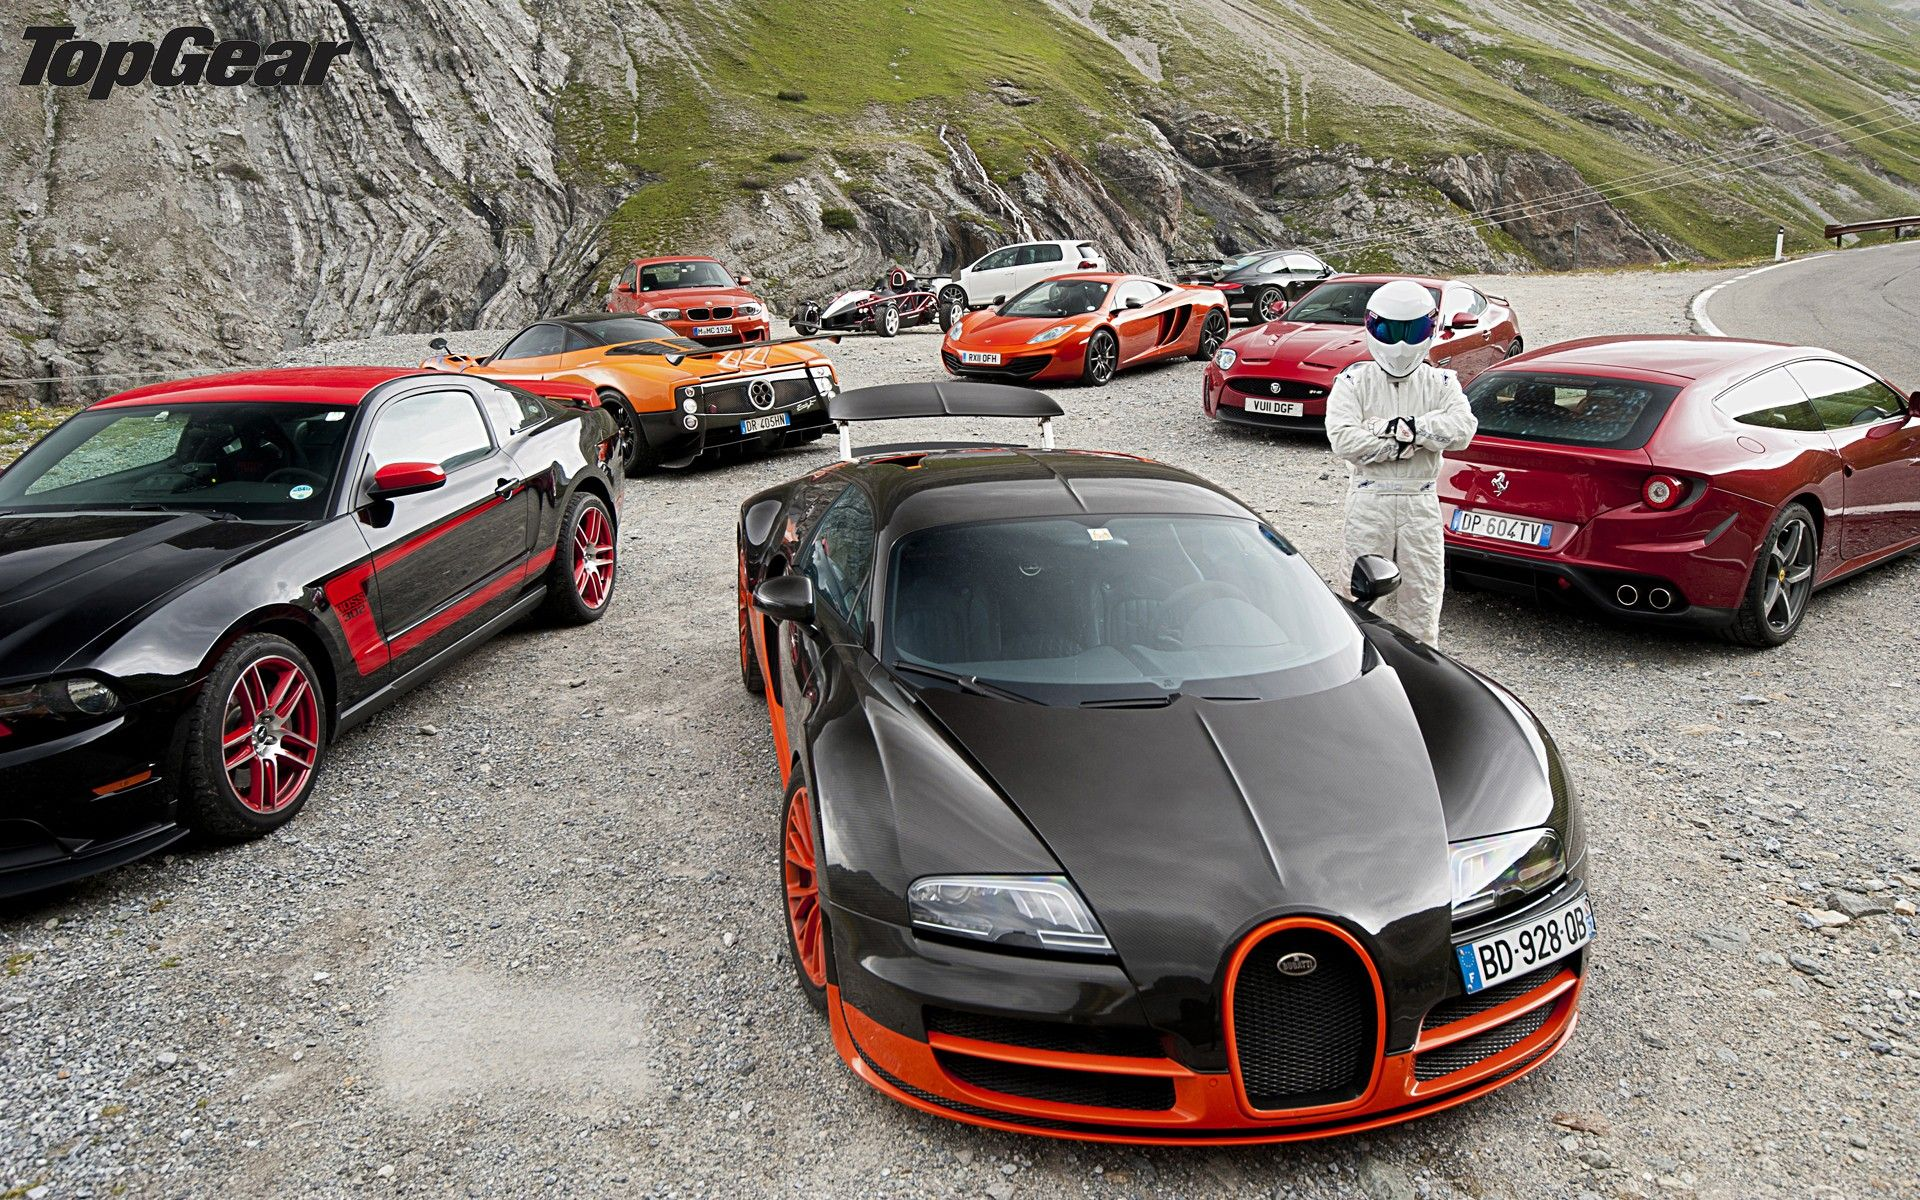 Top Gear Wallpaper Cerca Con Google Top Gear Wallpaper